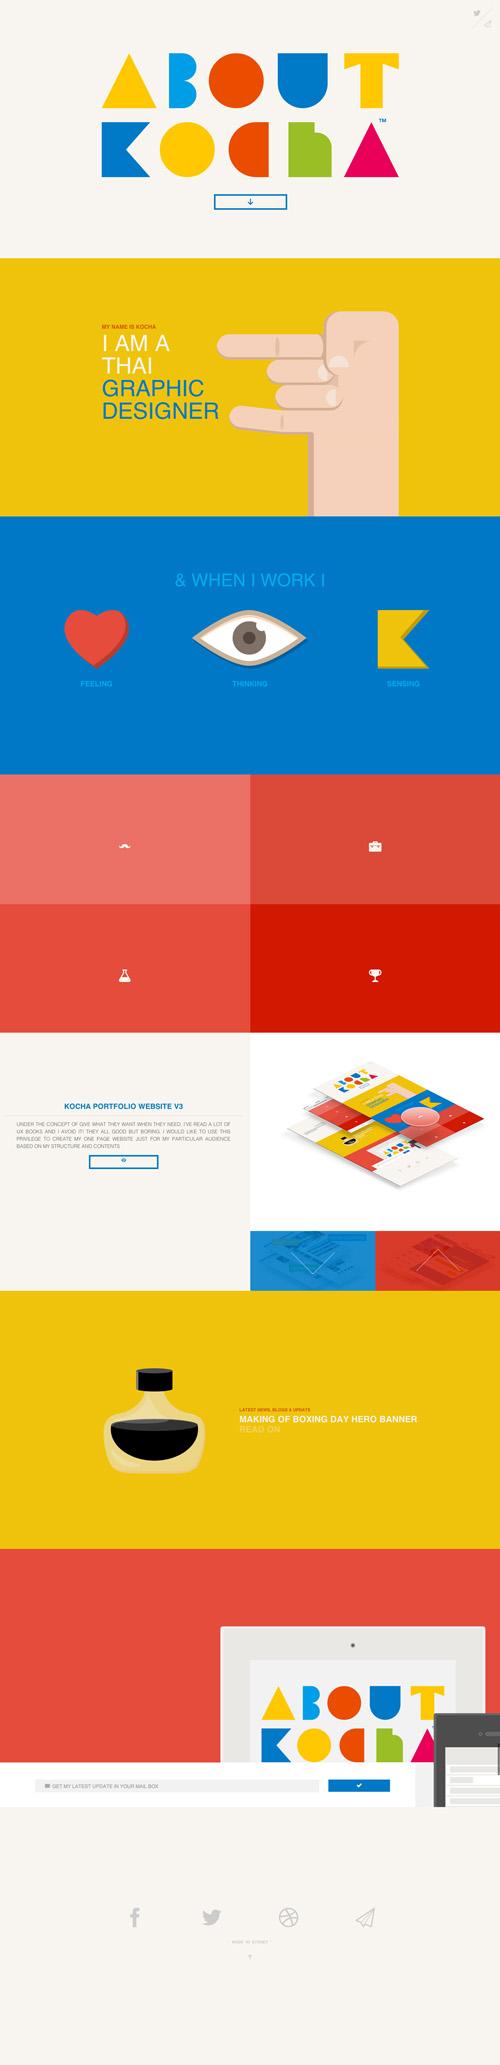 Kocha One Page Website Design